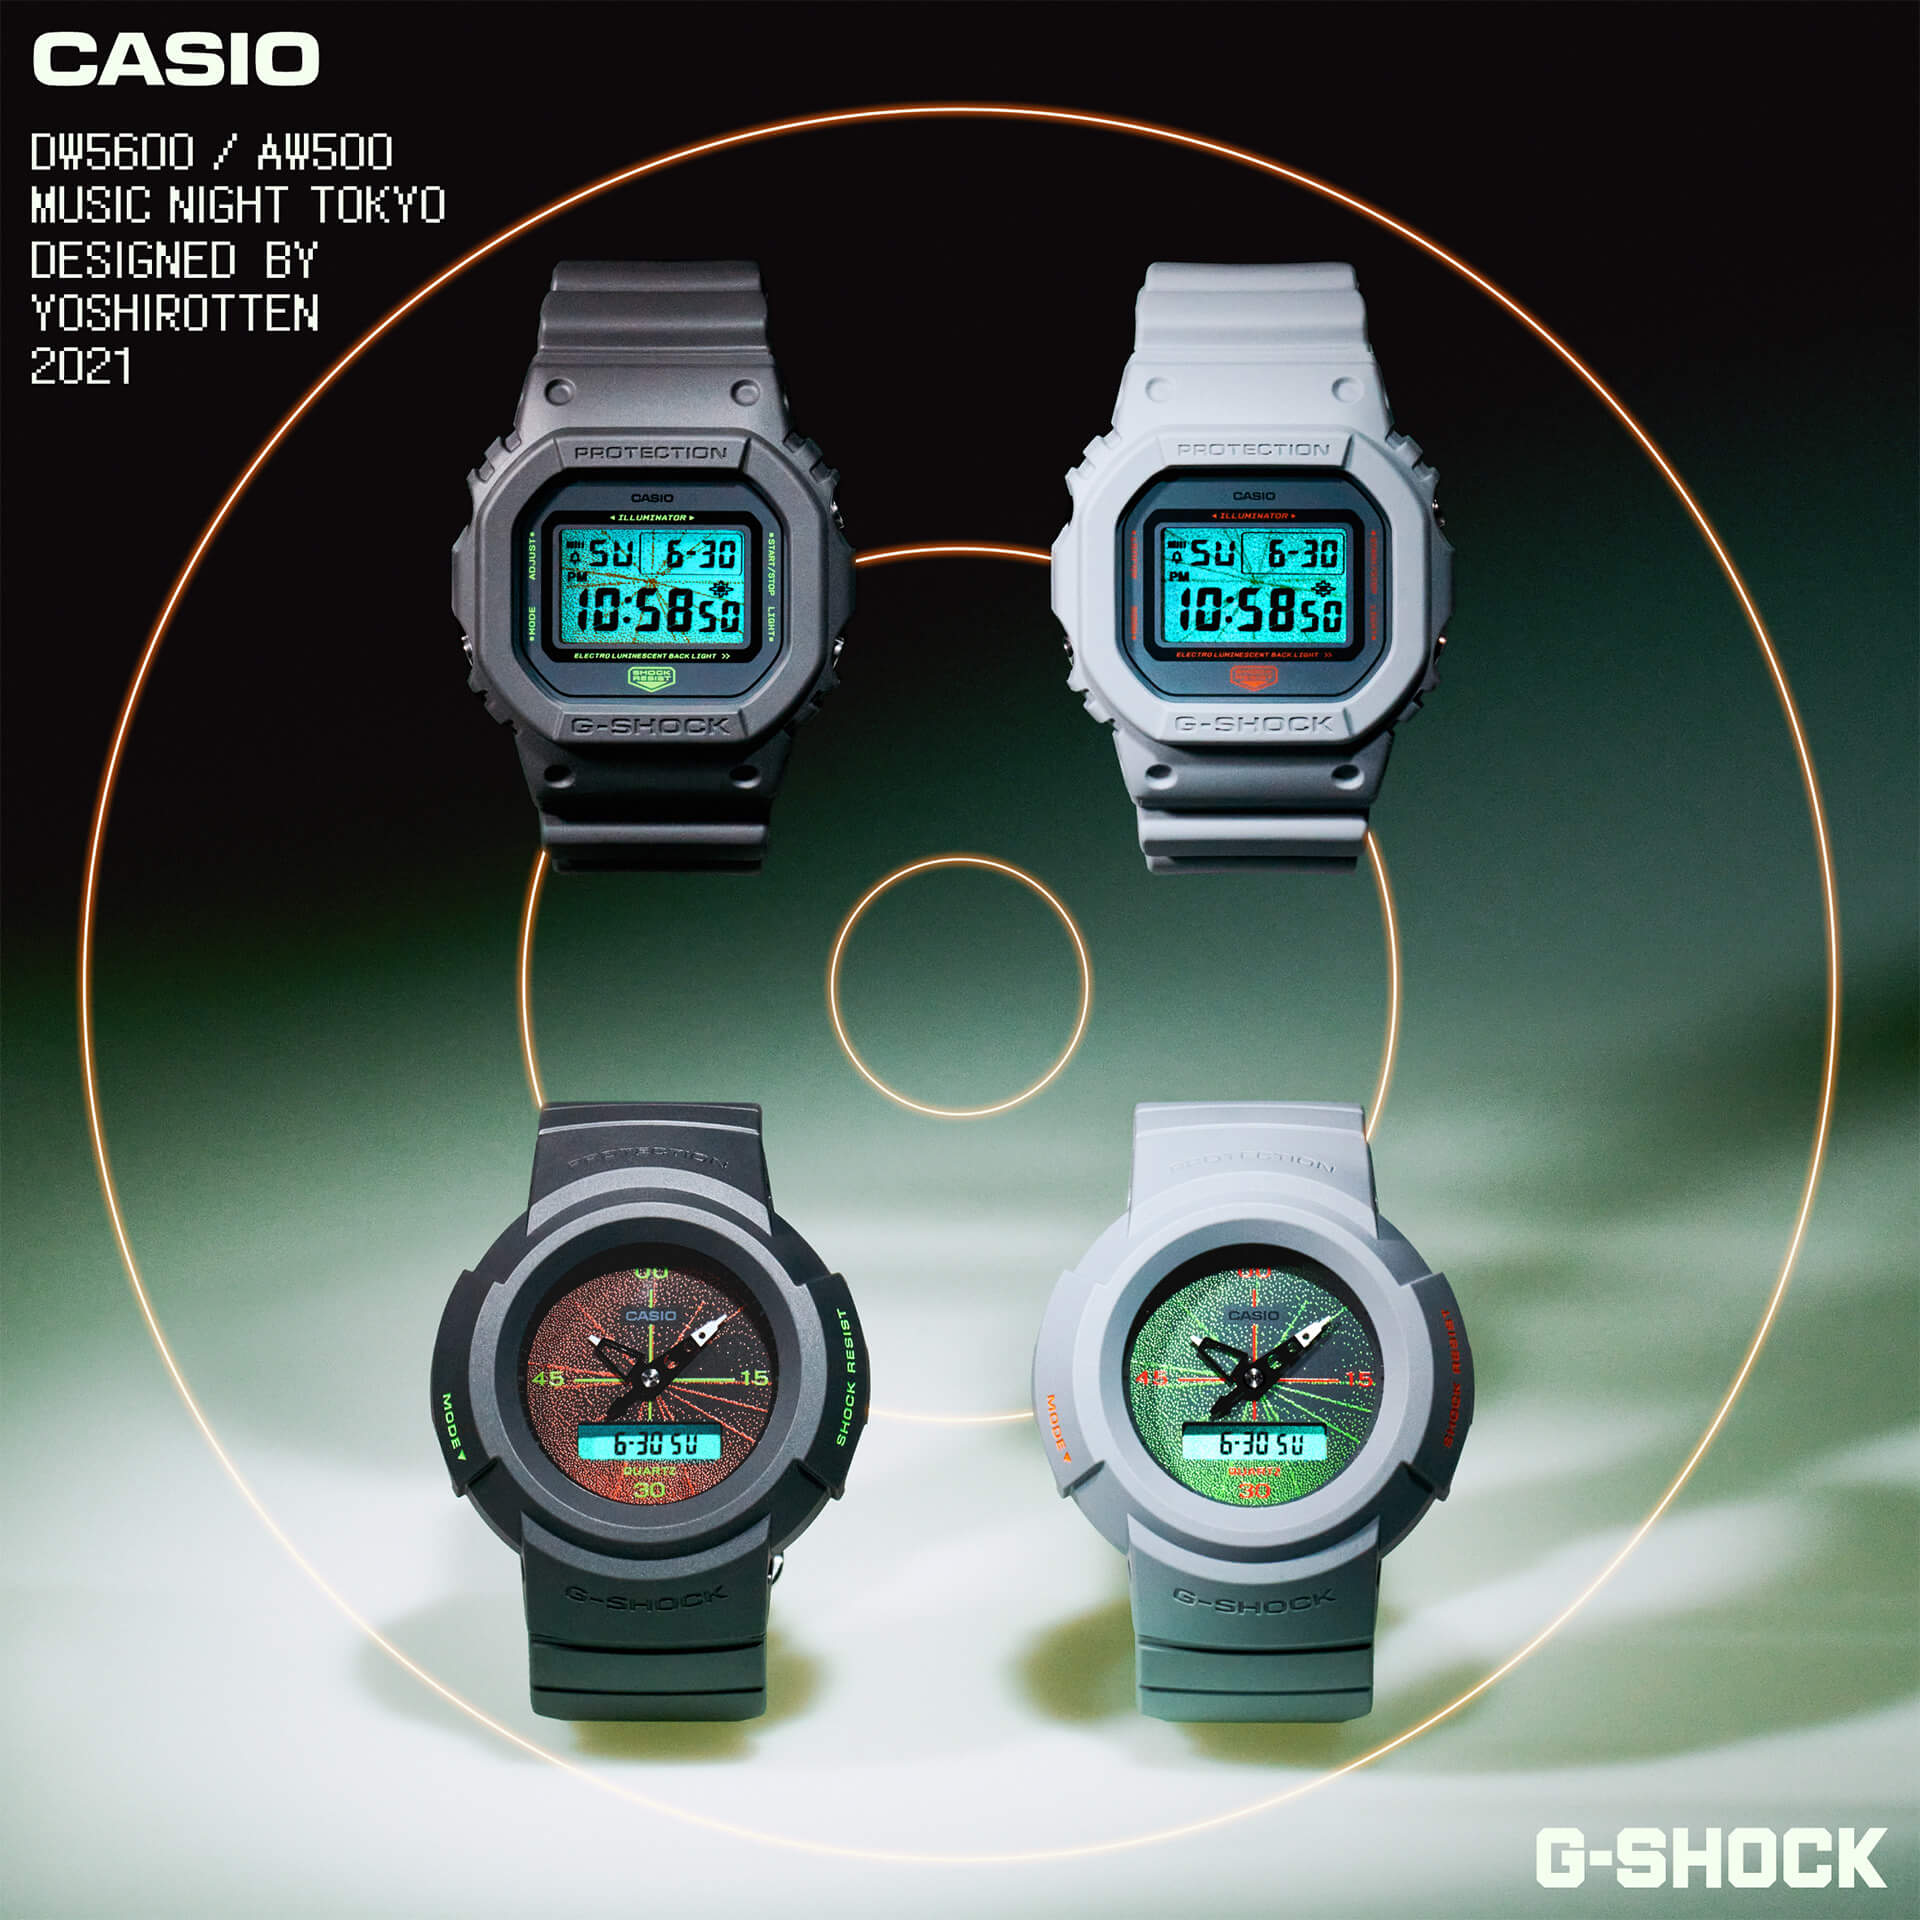 G-SHOCKとYOSHIROTTENのコラボウォッチが発売決定!DW-5600とAW-500をベースにした2モデルが登場 tech210602_gshock_yoshirotten_3